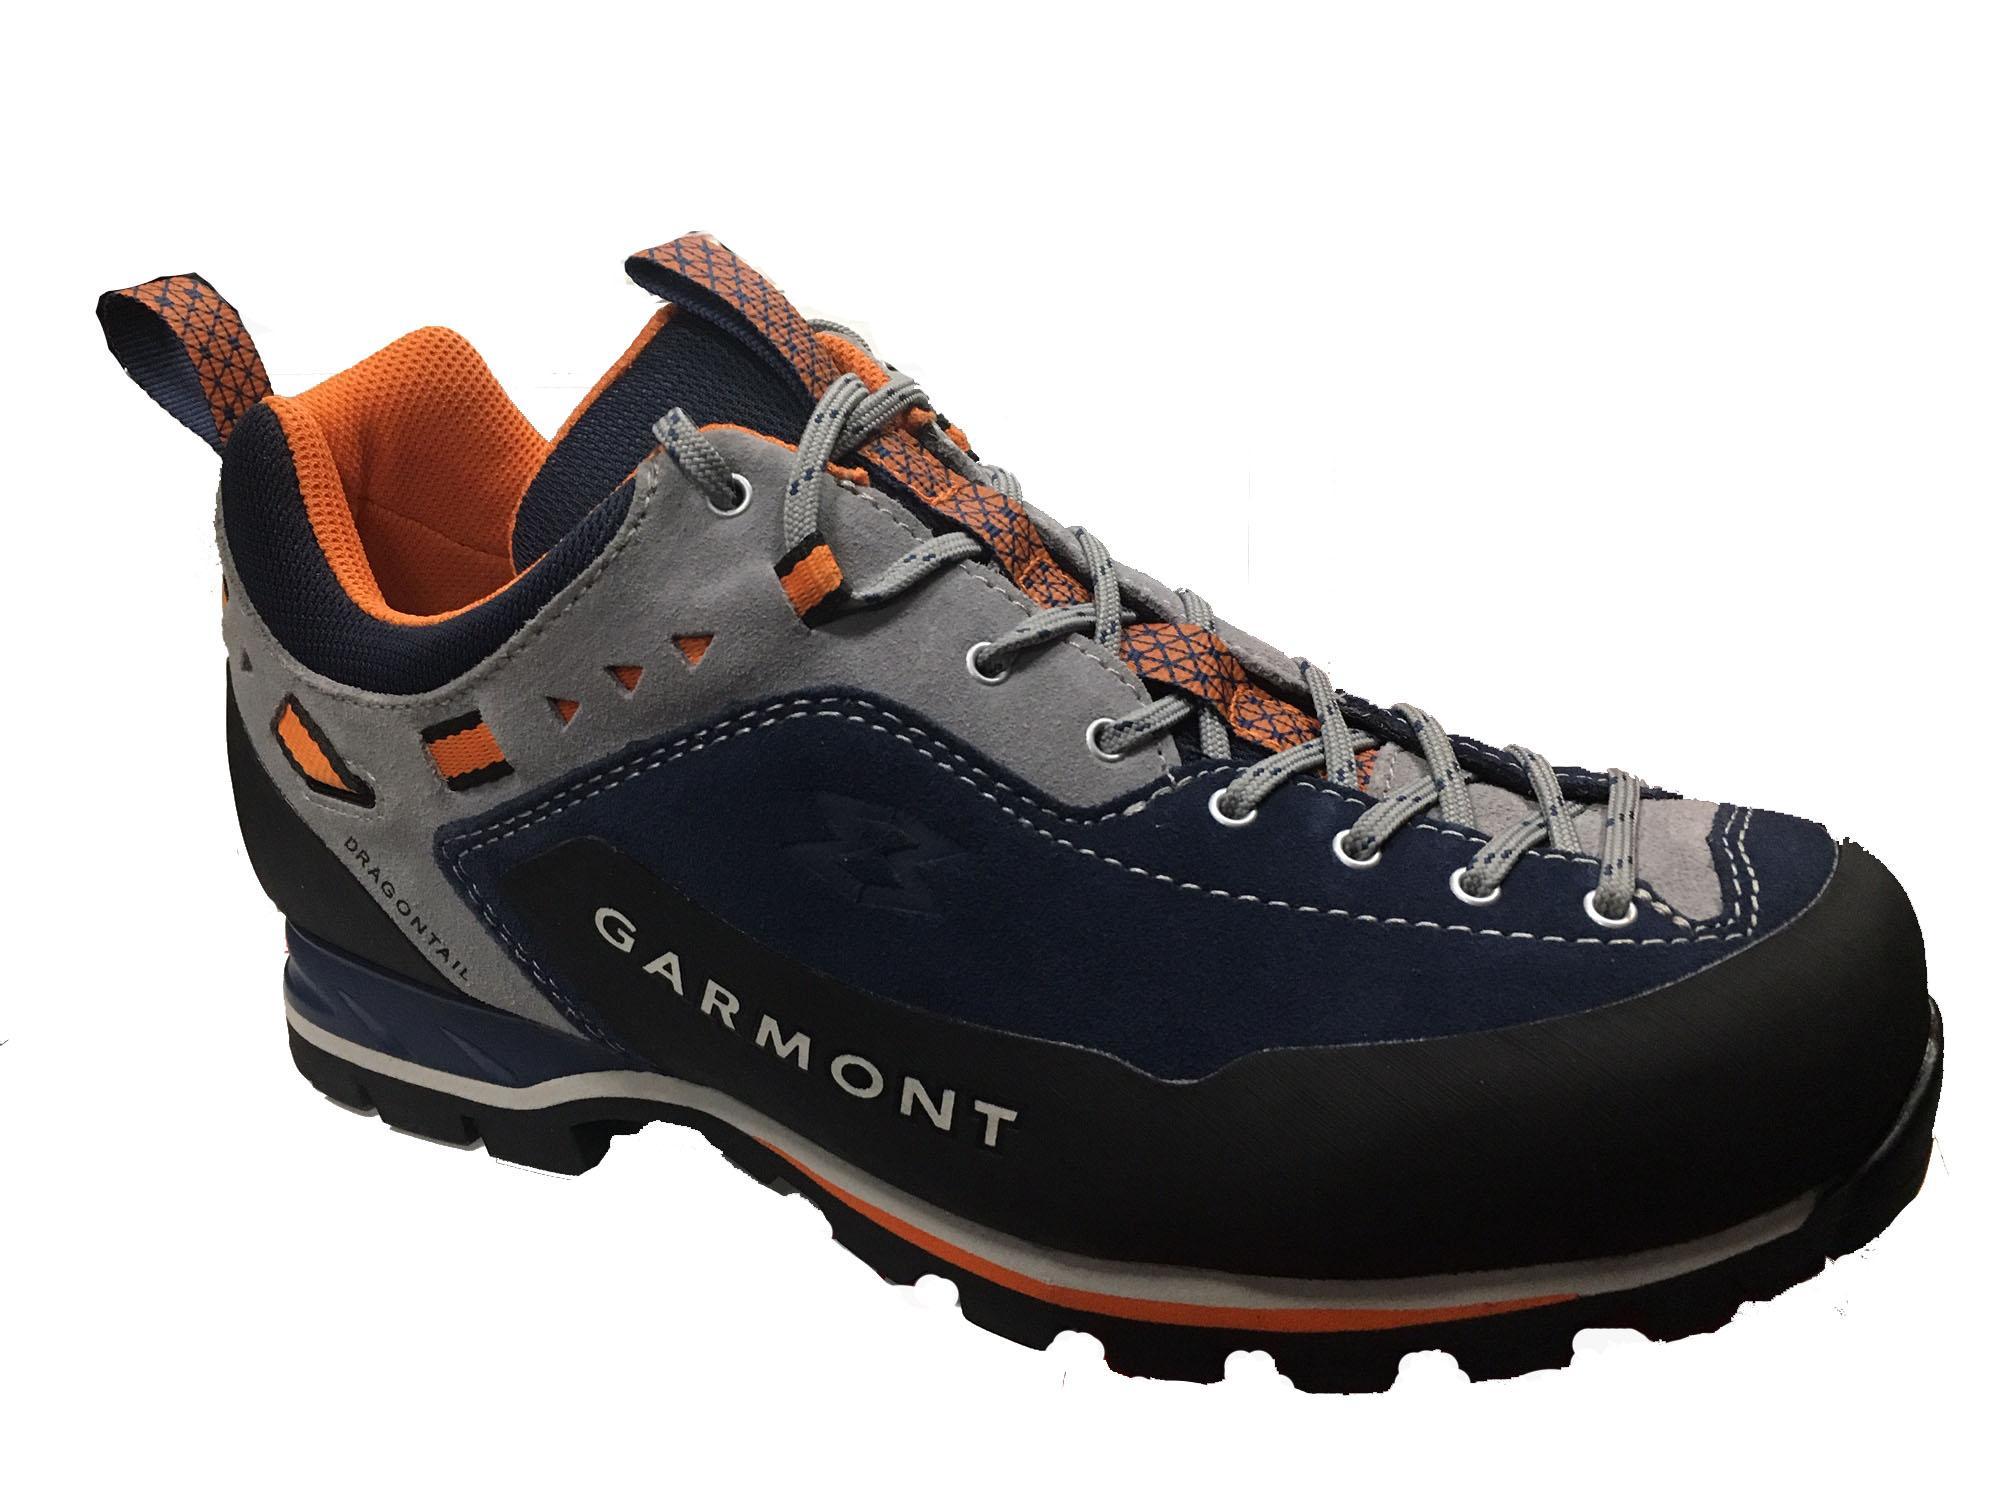 9b998b05ce9 Obuv GARMONT Dragontail MNT UK 10   Dark blue Orange